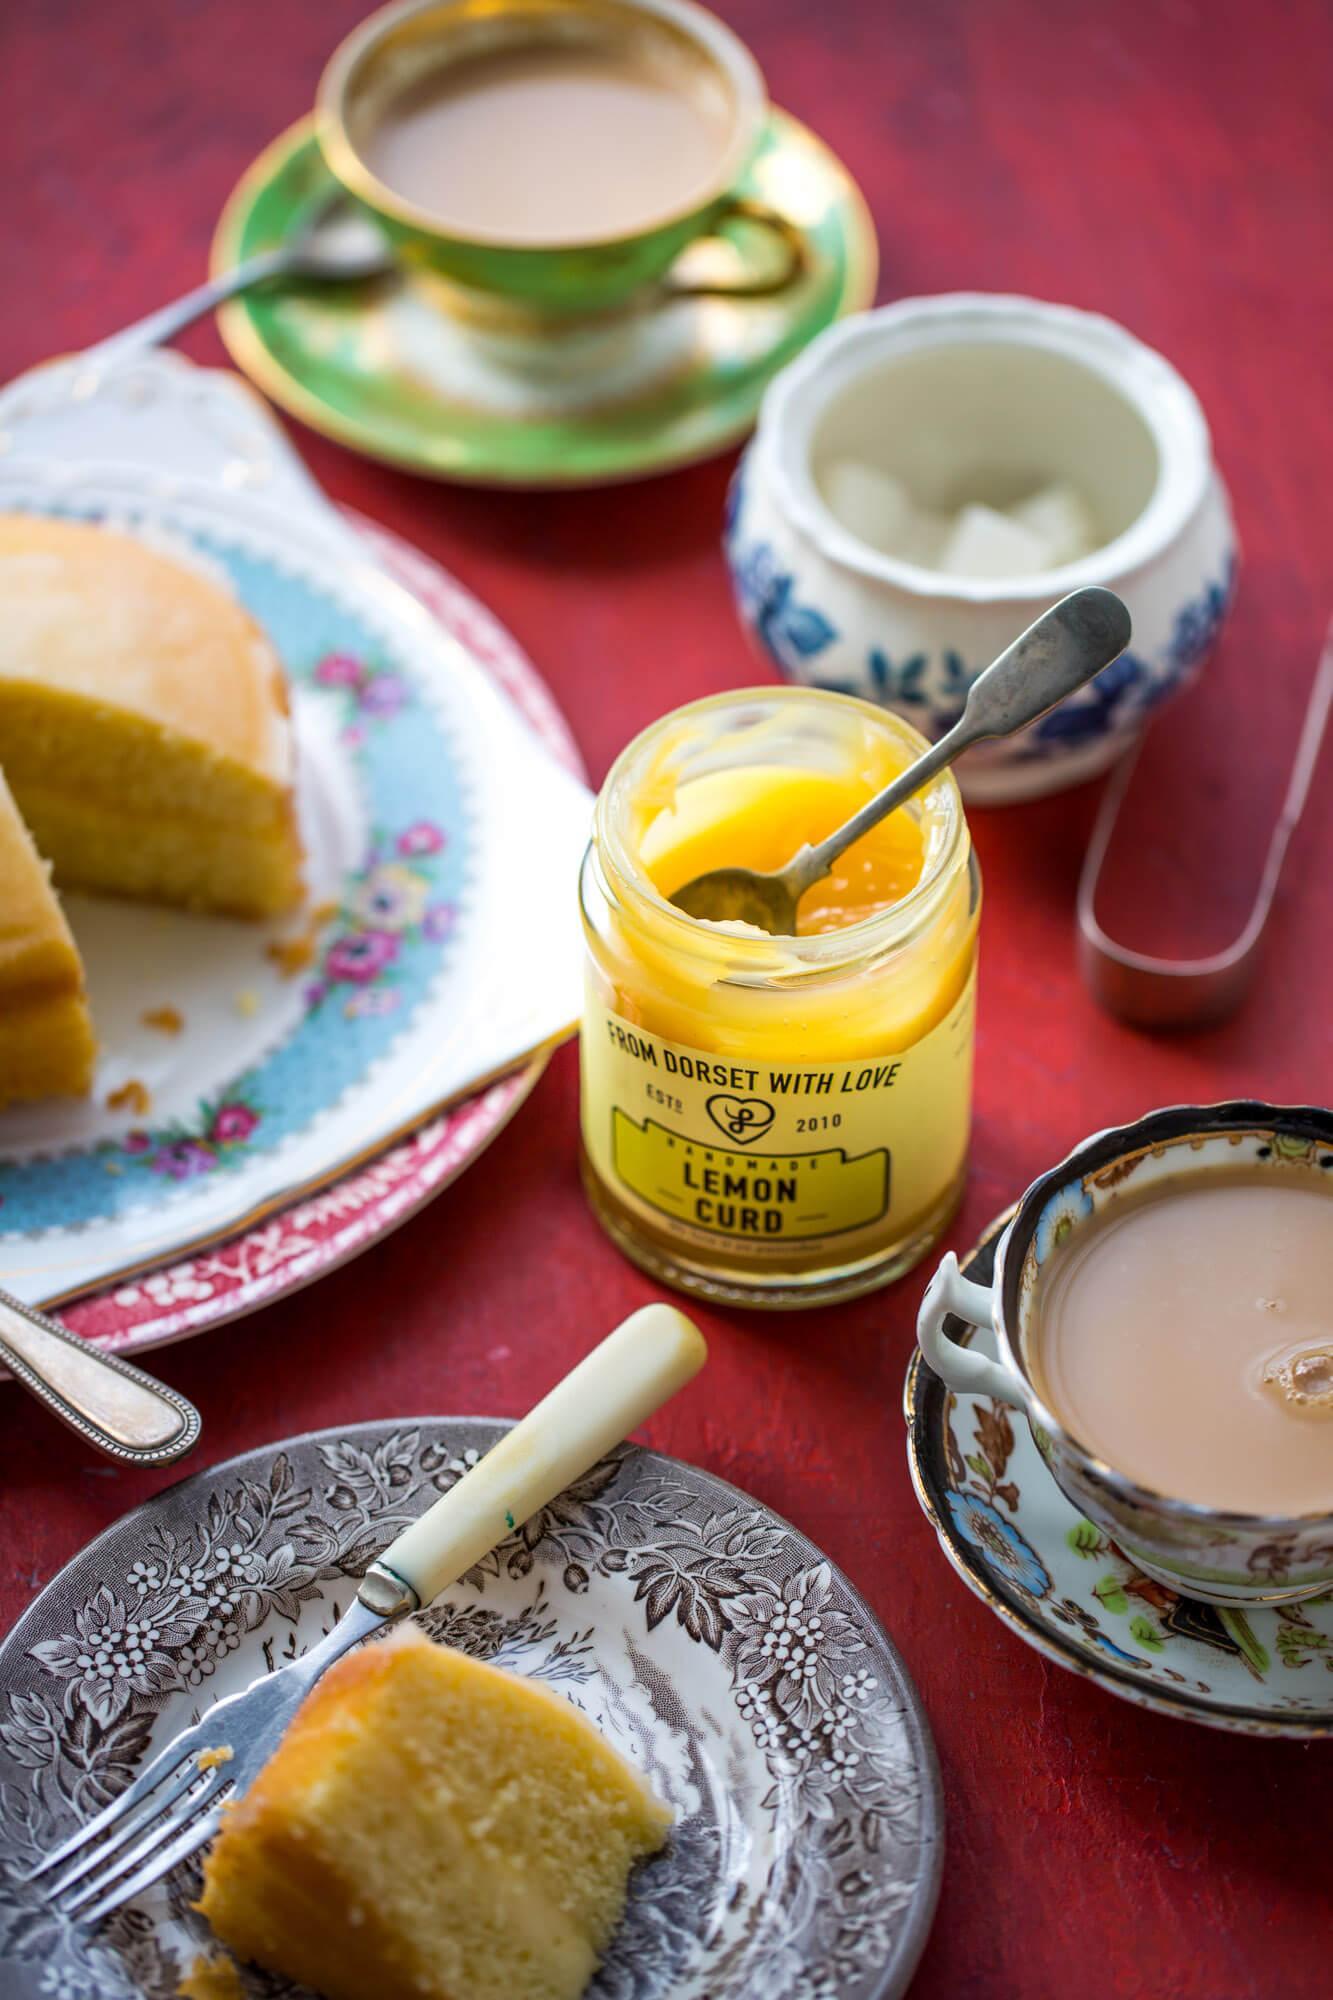 Lemon curd, Dorset- product photographer